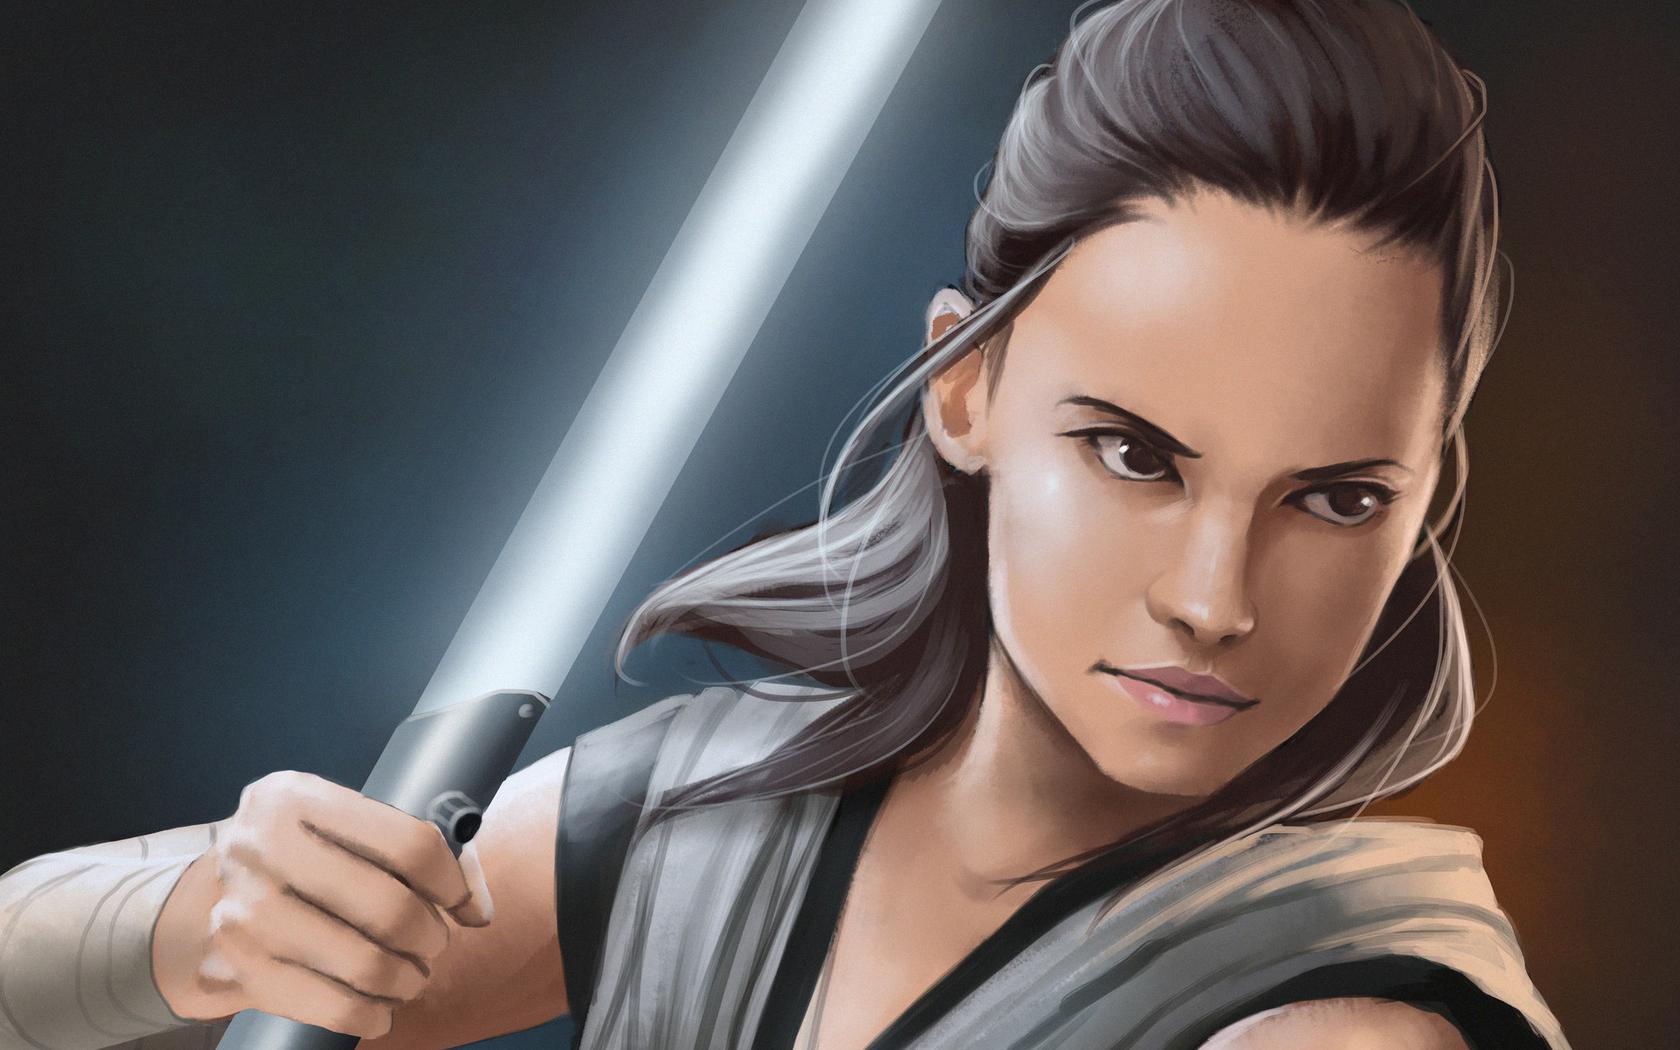 rey-star-wars-the-last-jedi-art-hd-dt.jpg